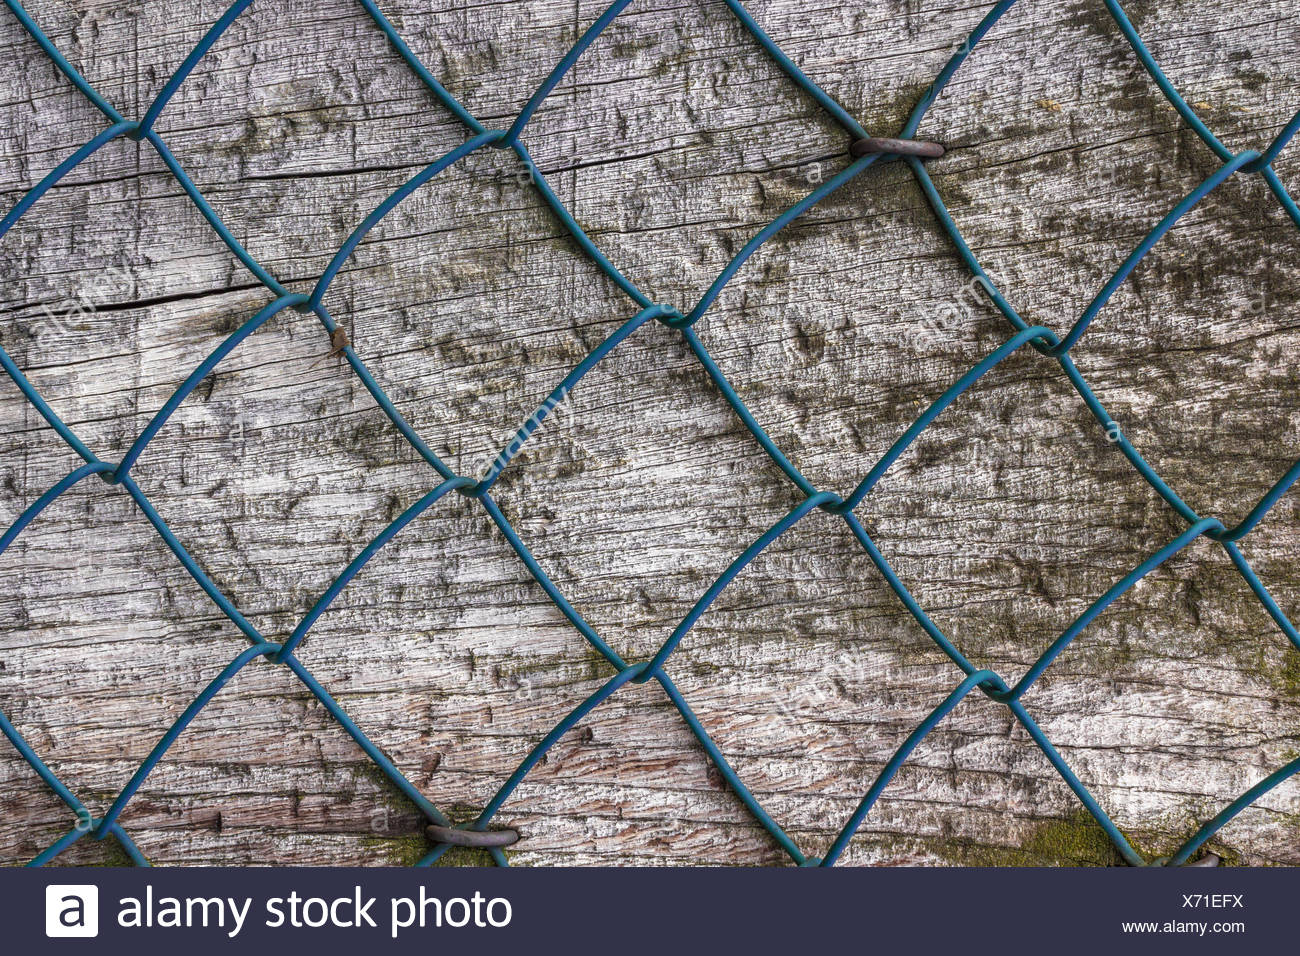 Diamond fence Stock Photo: 279701854 - Alamy